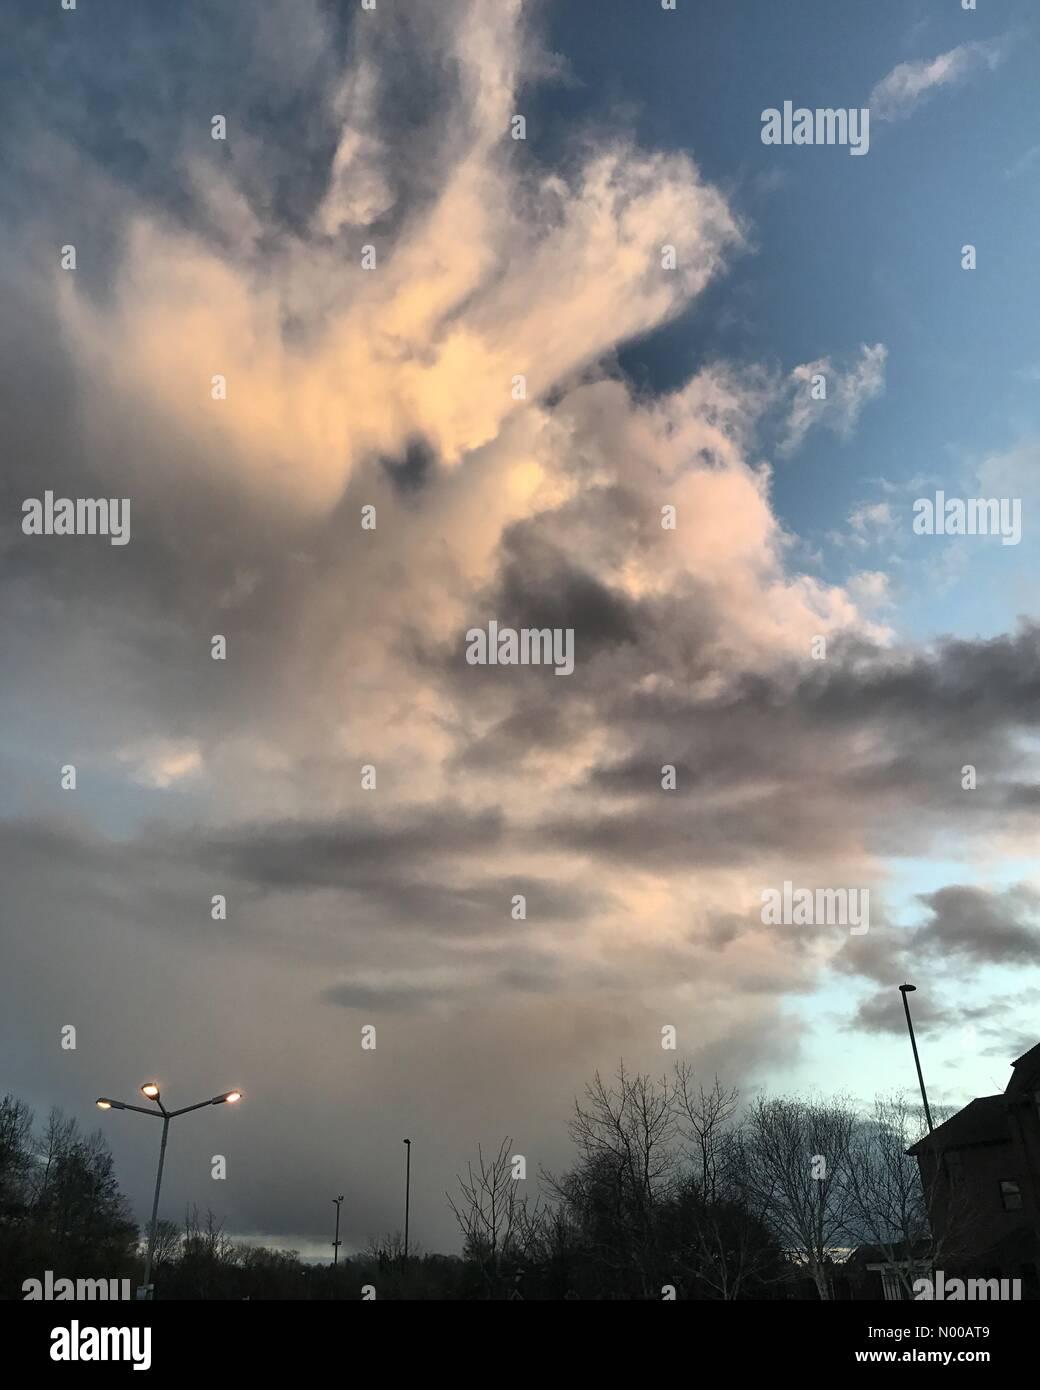 East St, Farnham, UK. 28th Jan, 2017. UK Weather: Stormy over Farnham. Dogflud Way, Farnham. 28th Jan 2017. Low - Stock Image